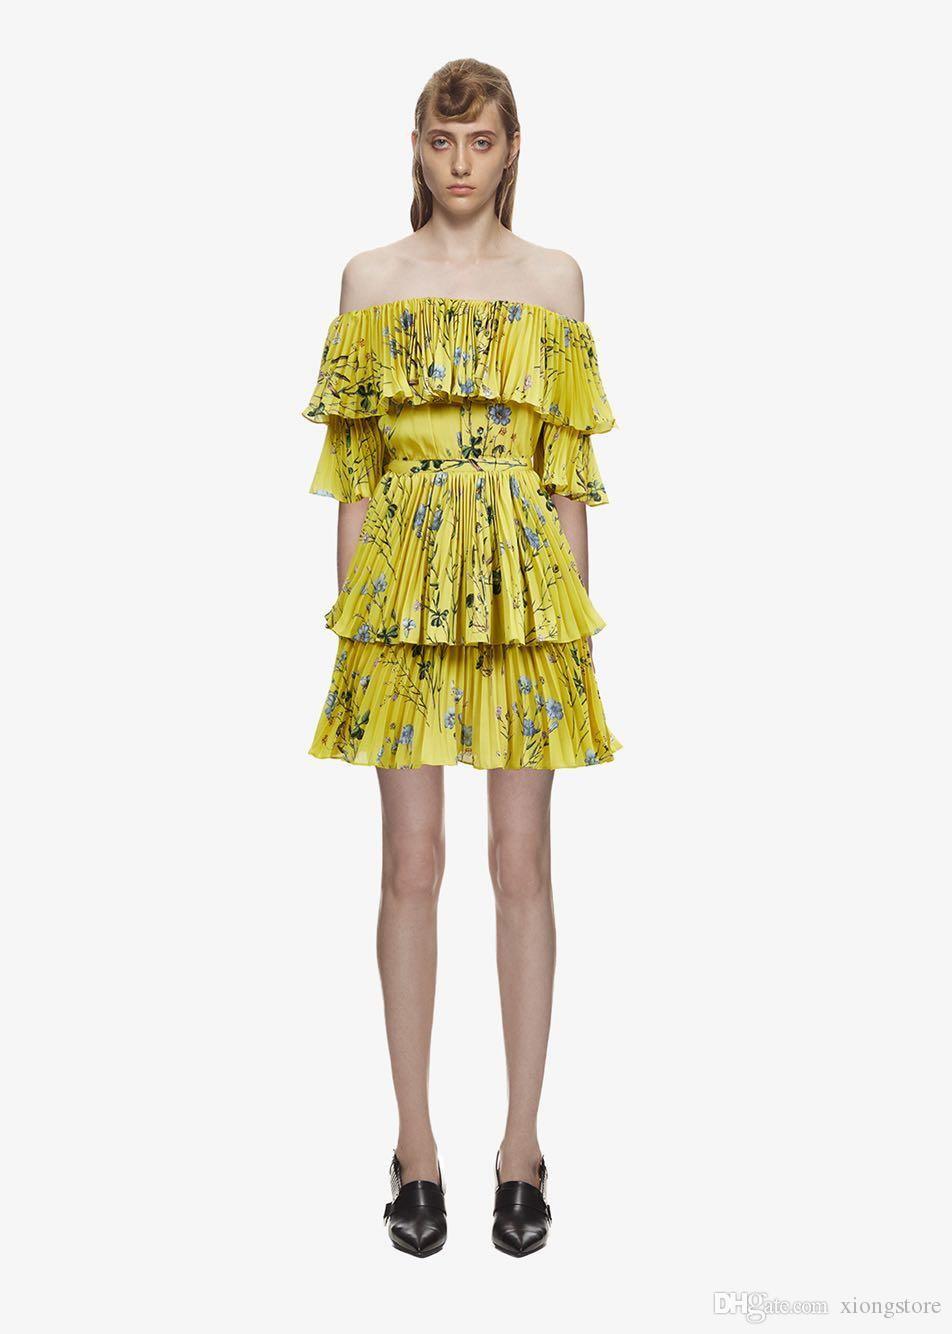 e8501c386cbc High Quality Self Portrait Dress 2018 Women Summer Bohemian Sexy Off  Shoulder Yellow Floral Printed Pleated Beach Party Dress Vestido Black Dress  On Sale ...